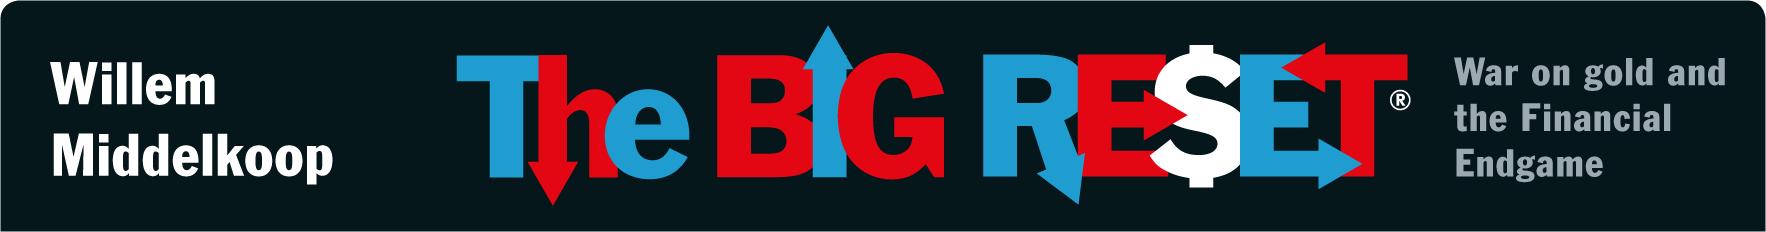 the_big_reset_banner.png&f=1&nofb=1